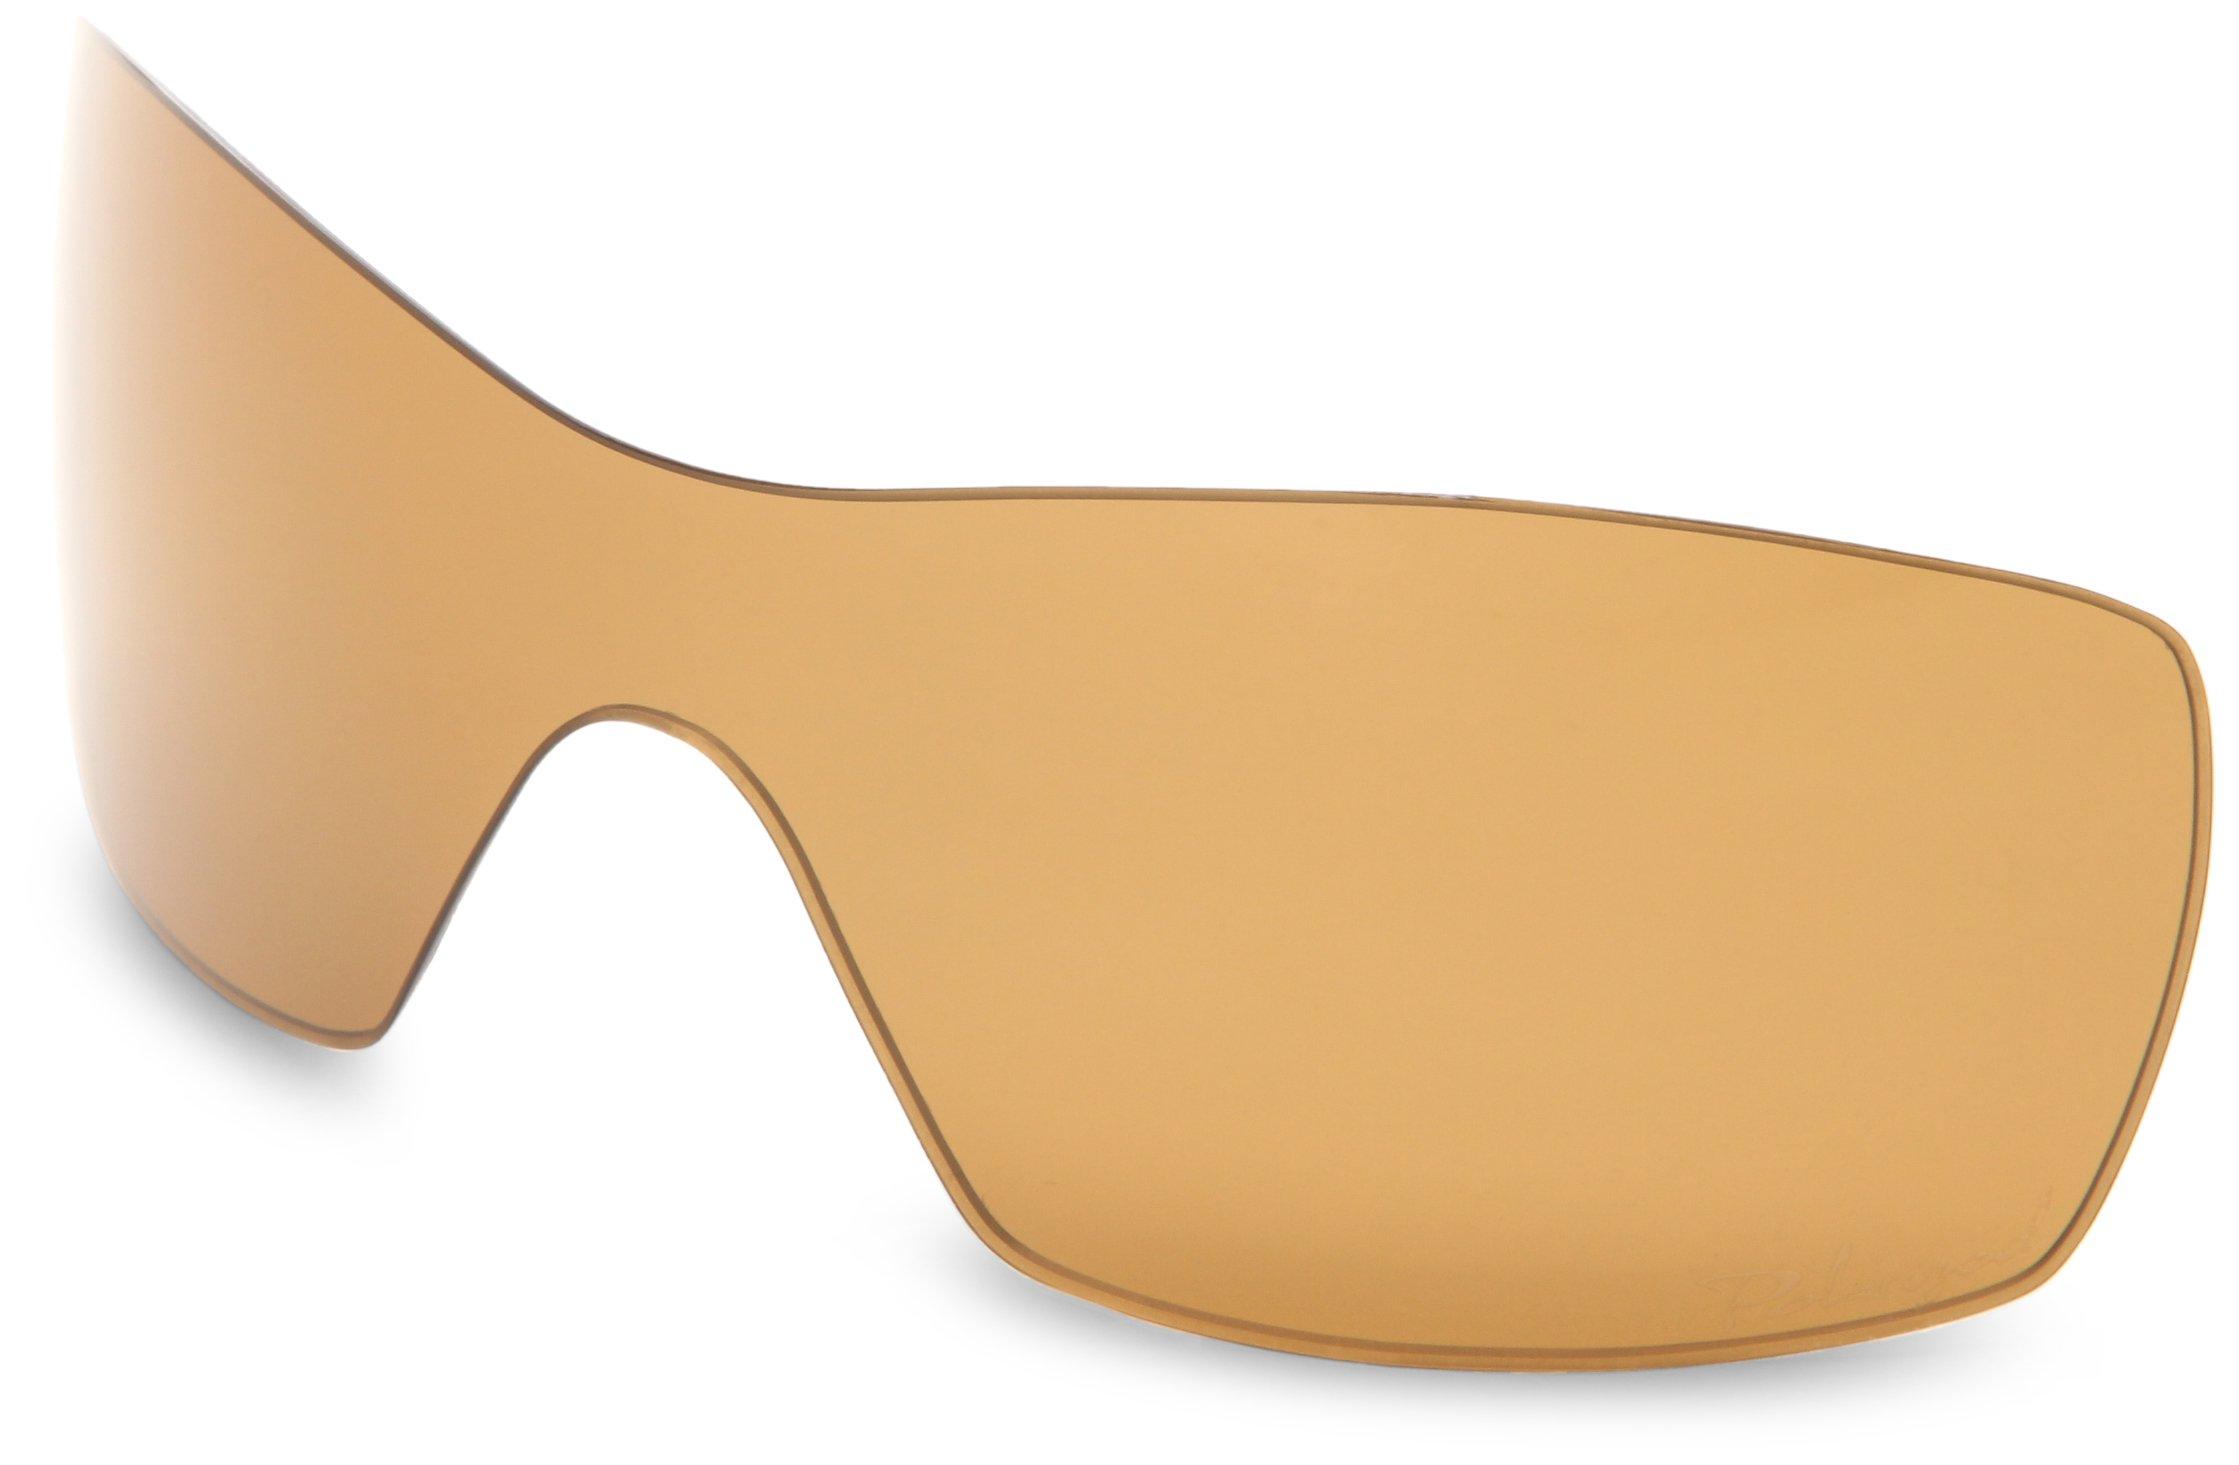 Oakley Dart 13-982 Polarized Rimless Sunglasses,Multi Frame/Bronze Lens,One Size